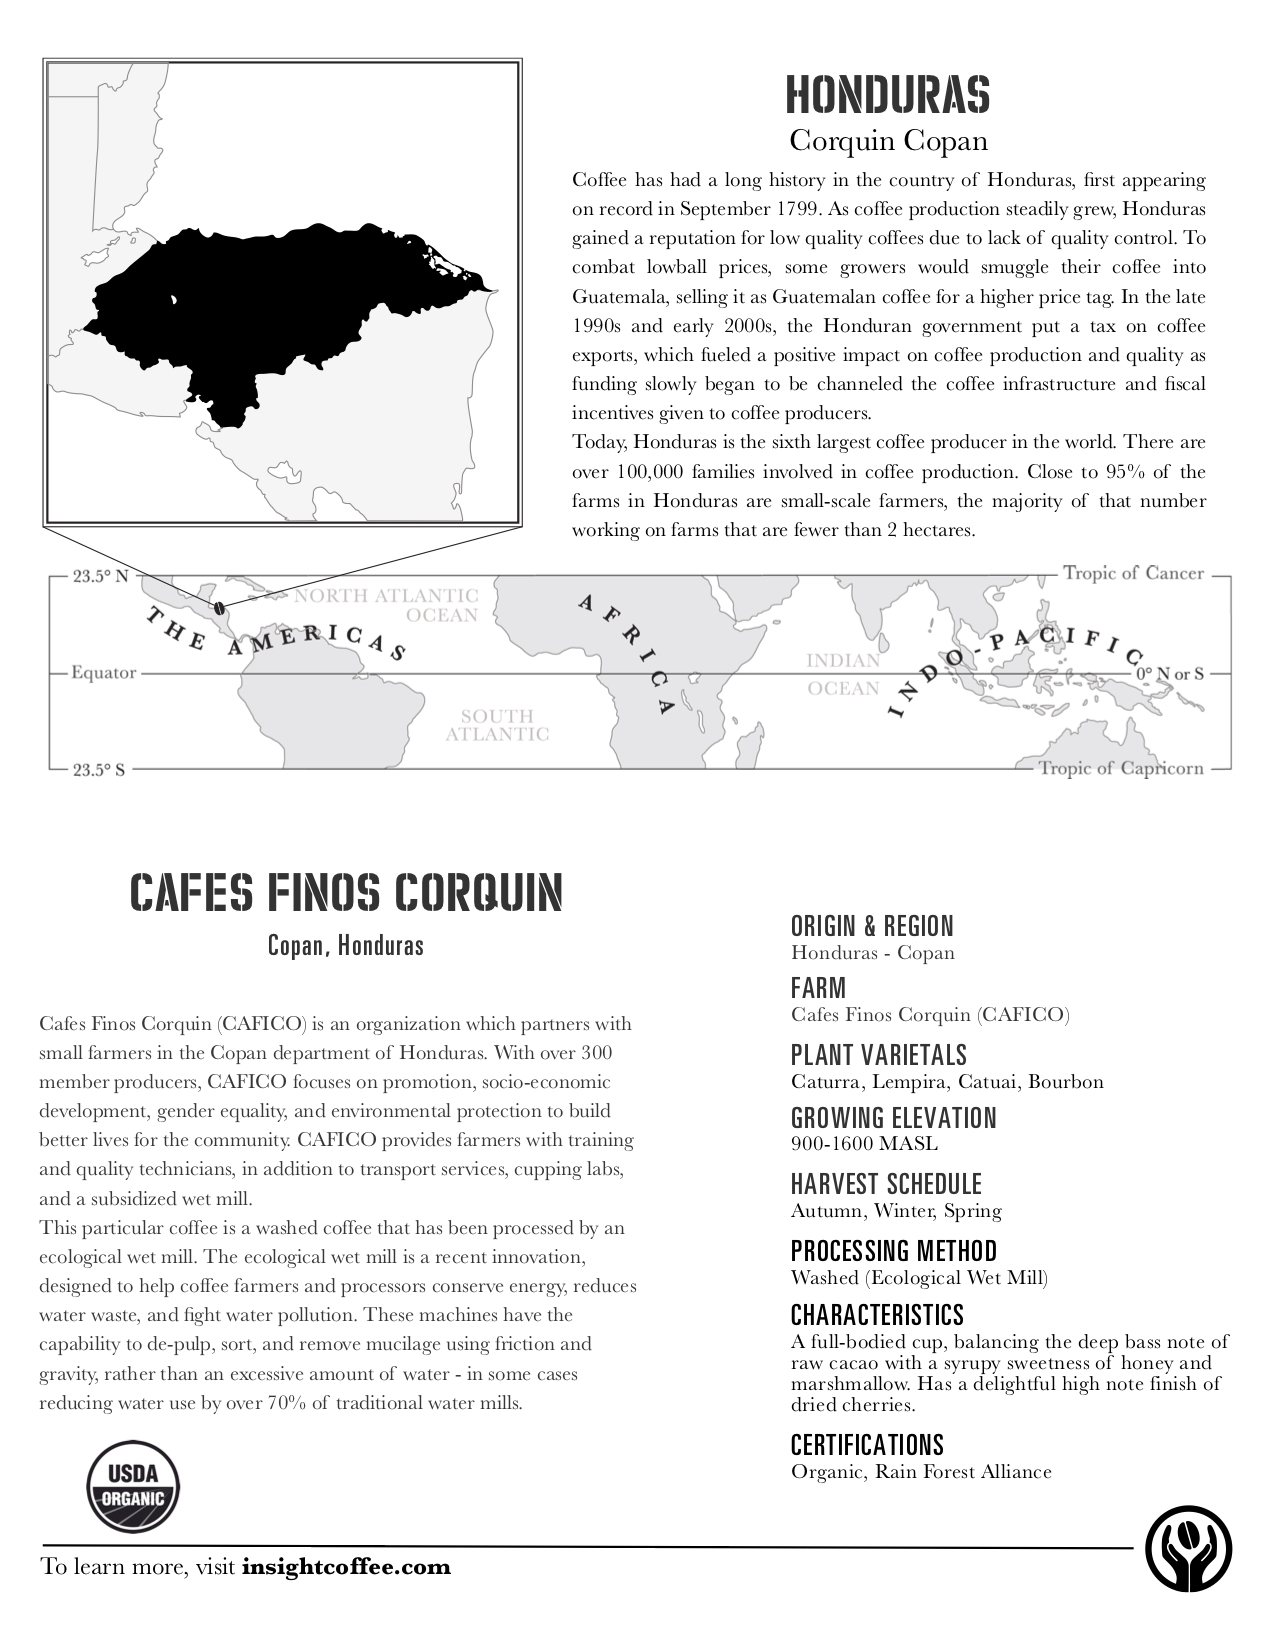 Honduras Corquin Copan.jpg